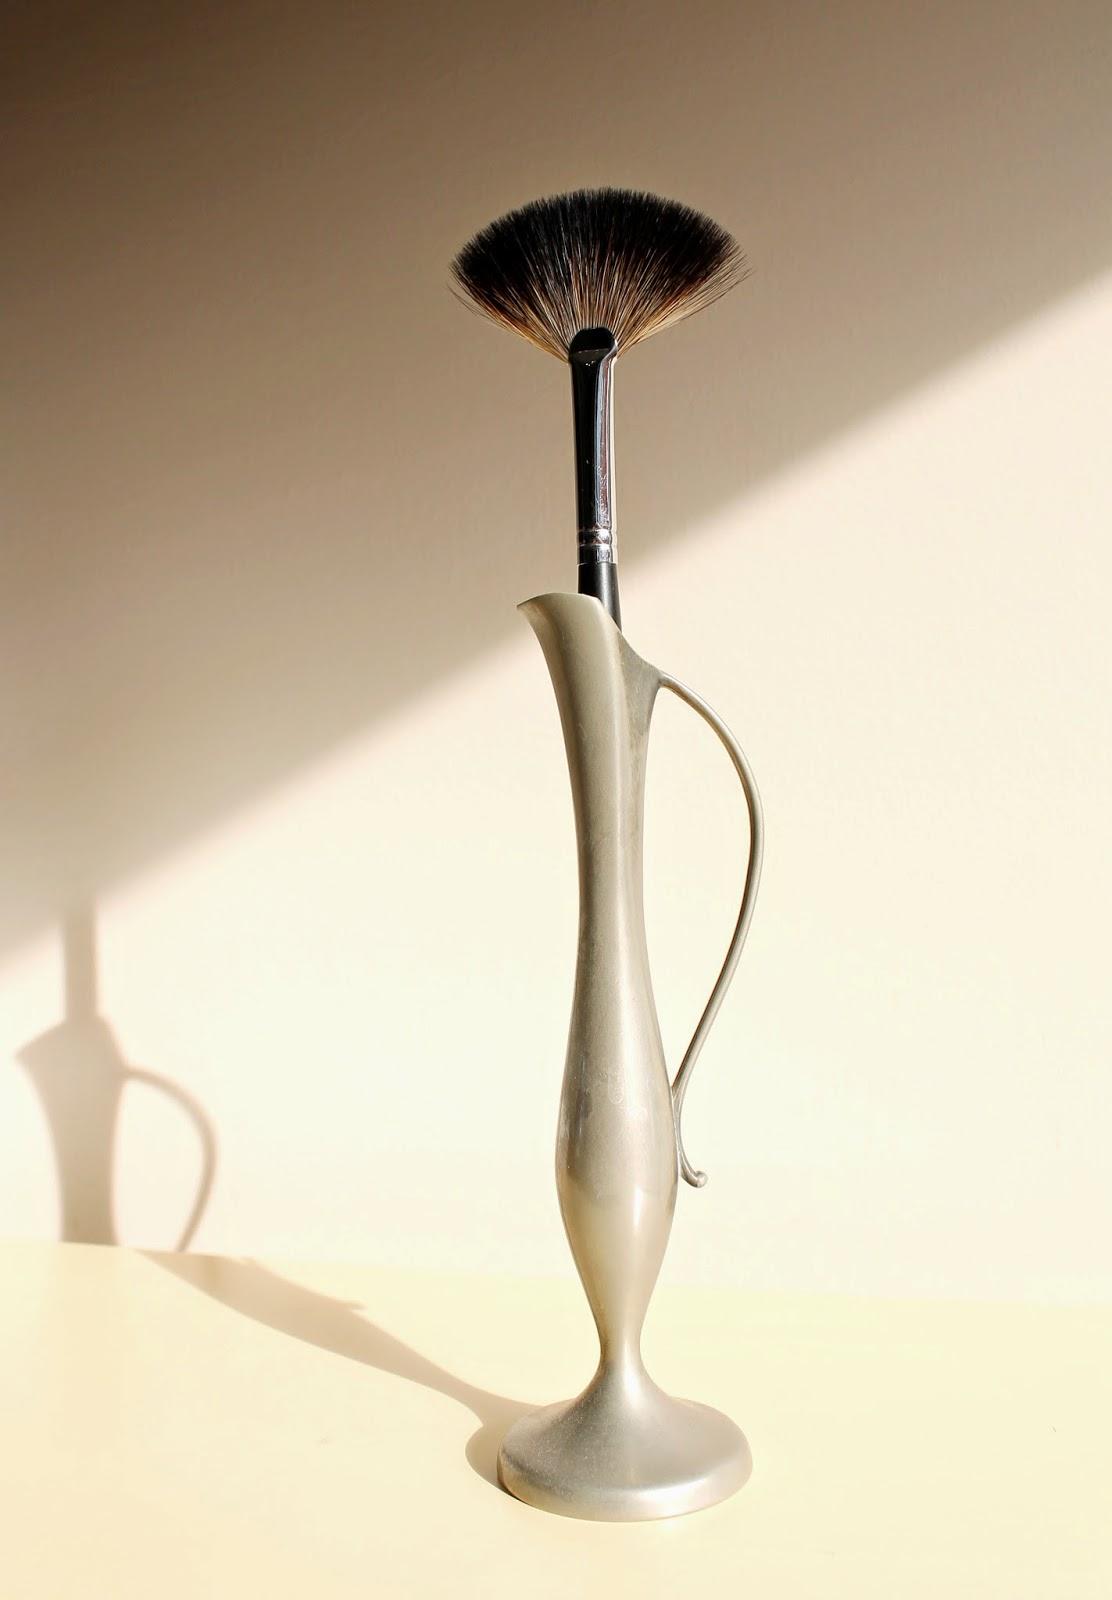 fan brush makeup brush racoon brush